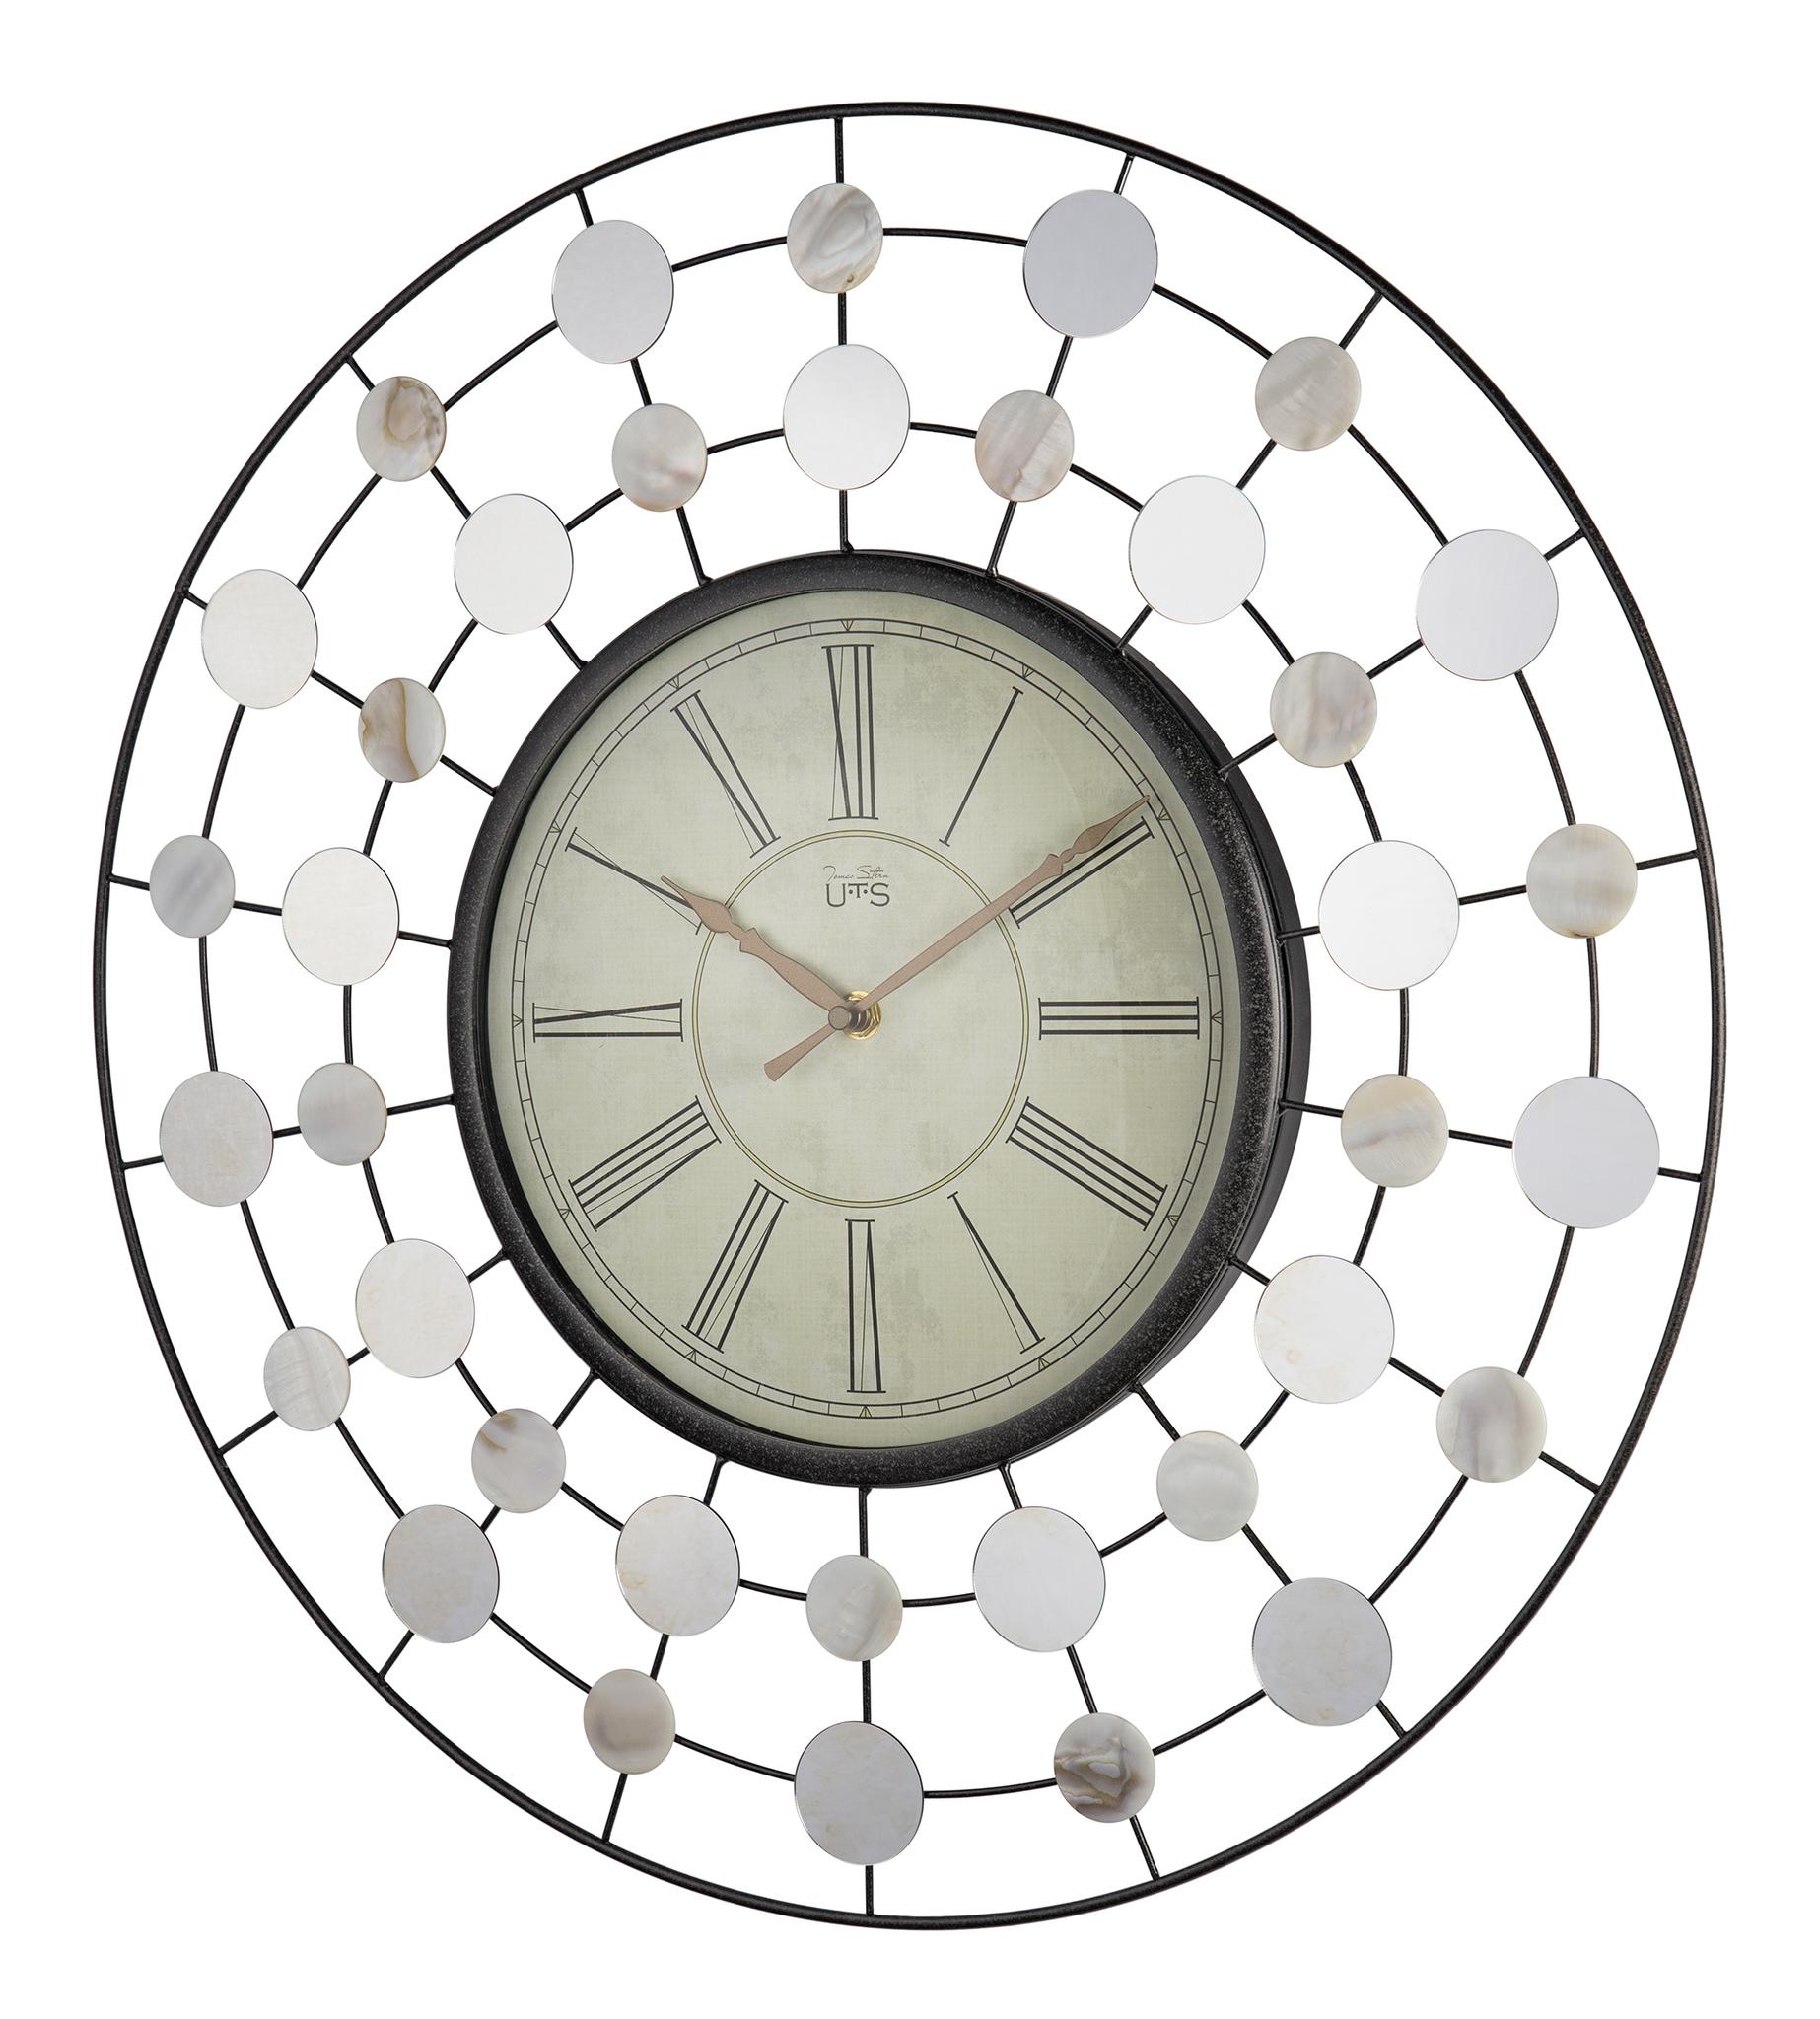 Часы настенные Часы настенные Tomas Stern 9044 chasy-nastennye-tomas-stern-9044-germaniya.jpg